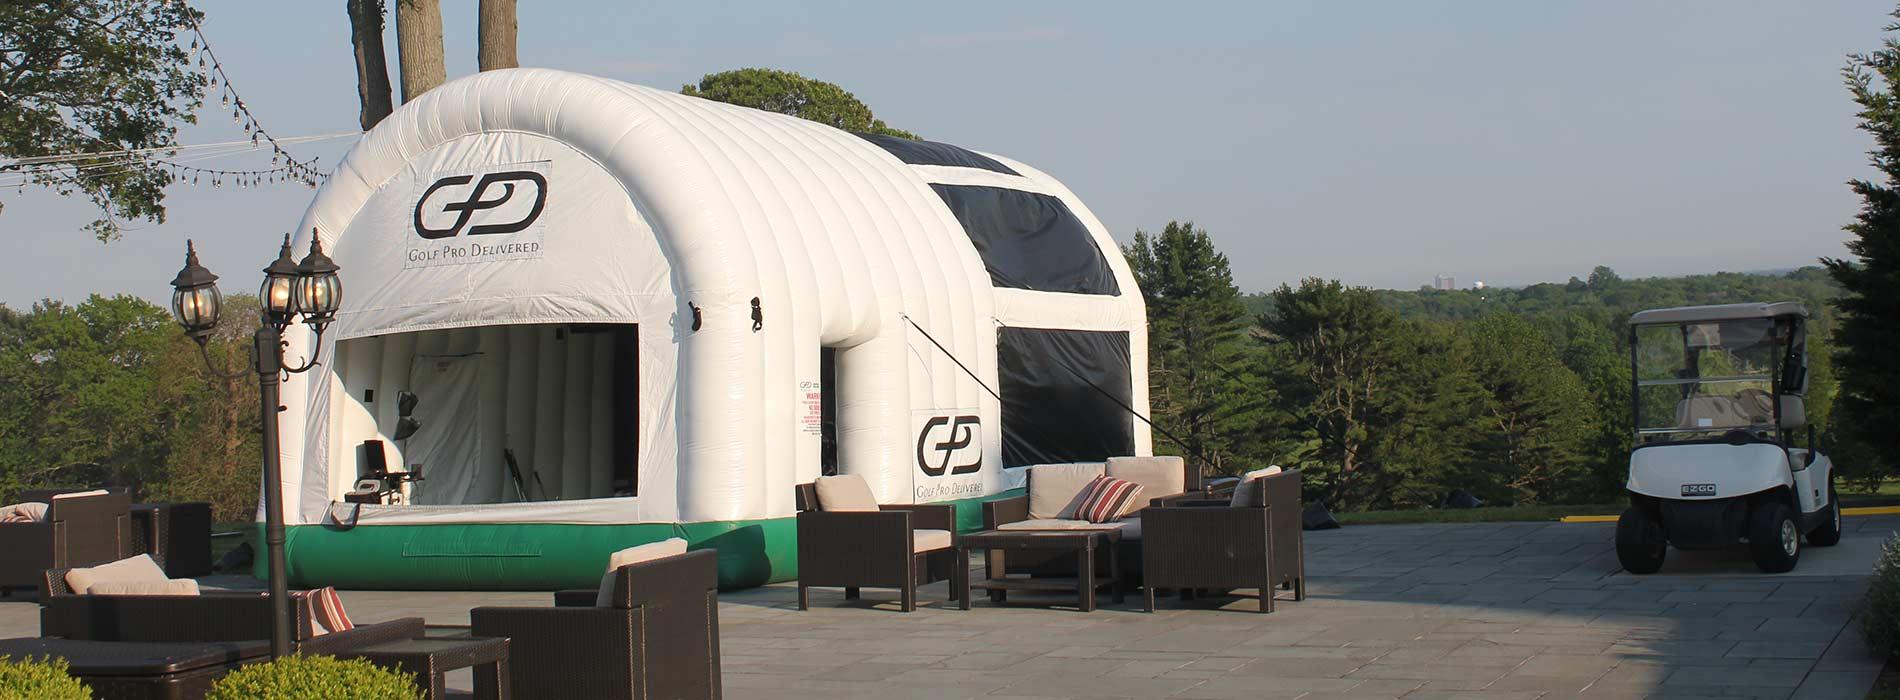 Inflatable Golf Simulators